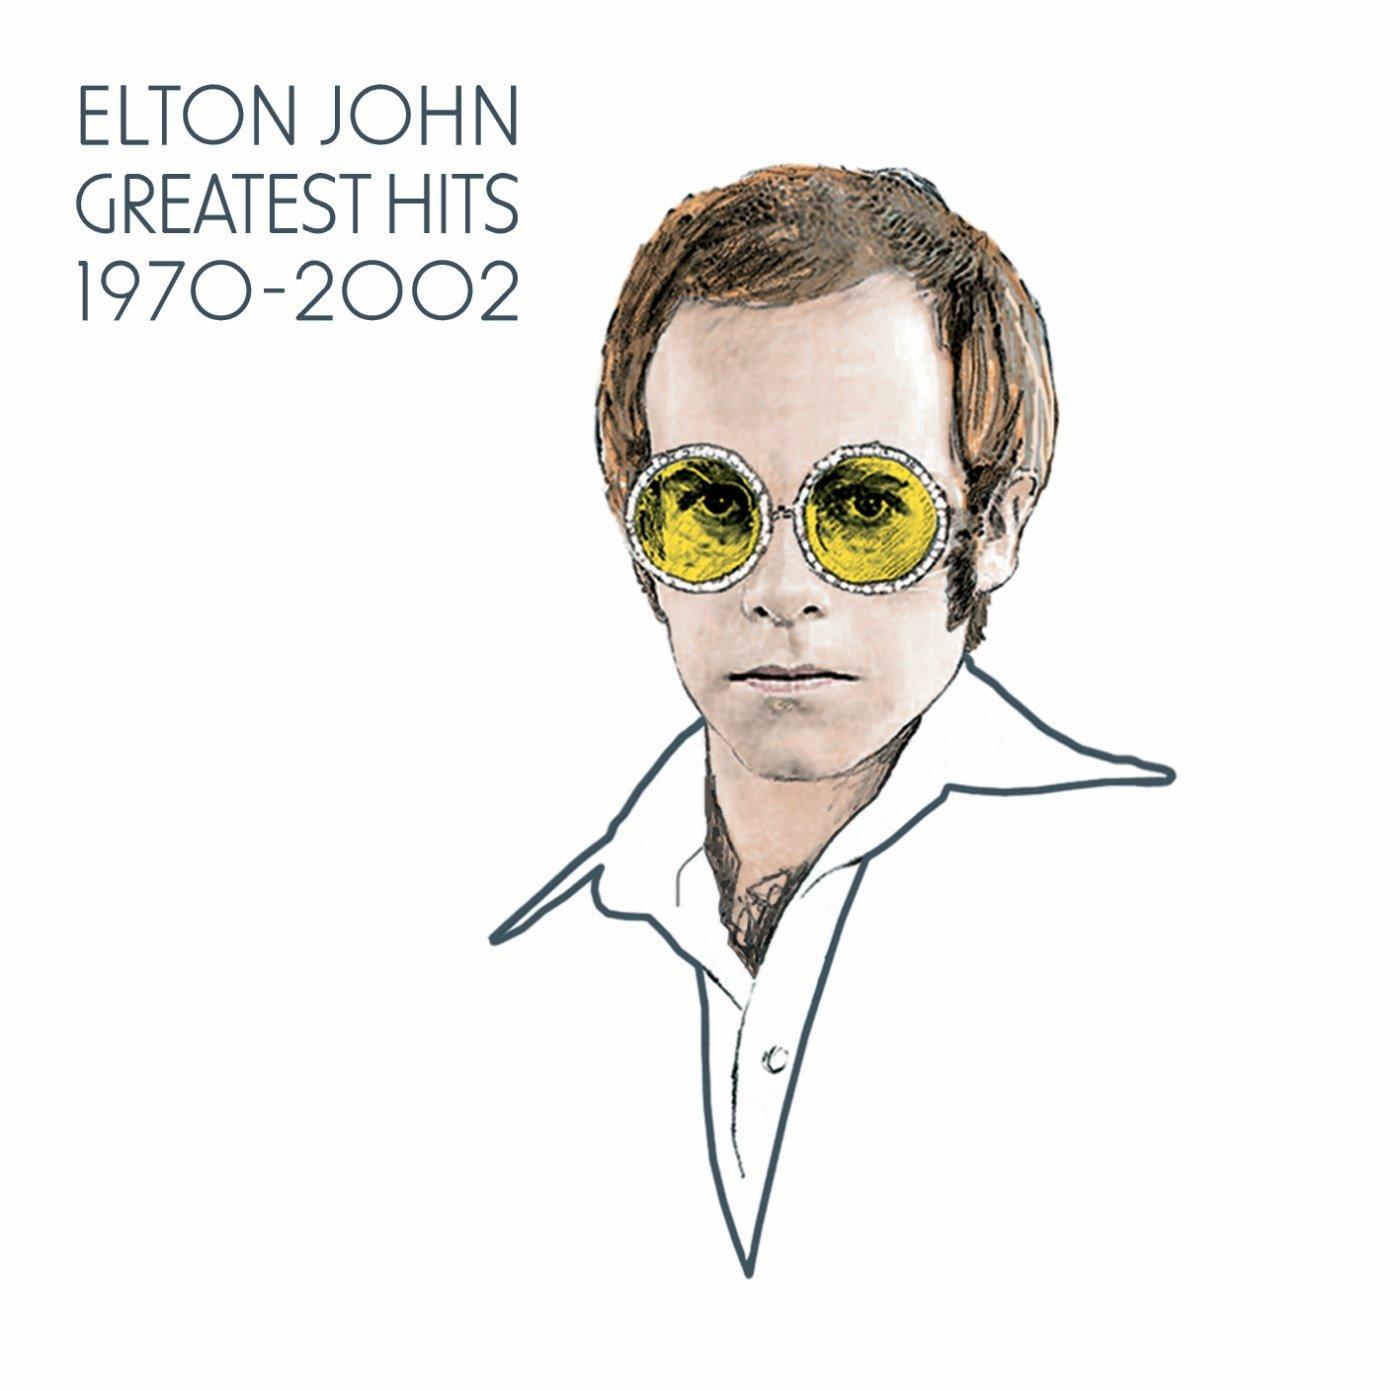 Elton John - Greatest Hits 1970-2002 (Limited Edtion+ by Imports